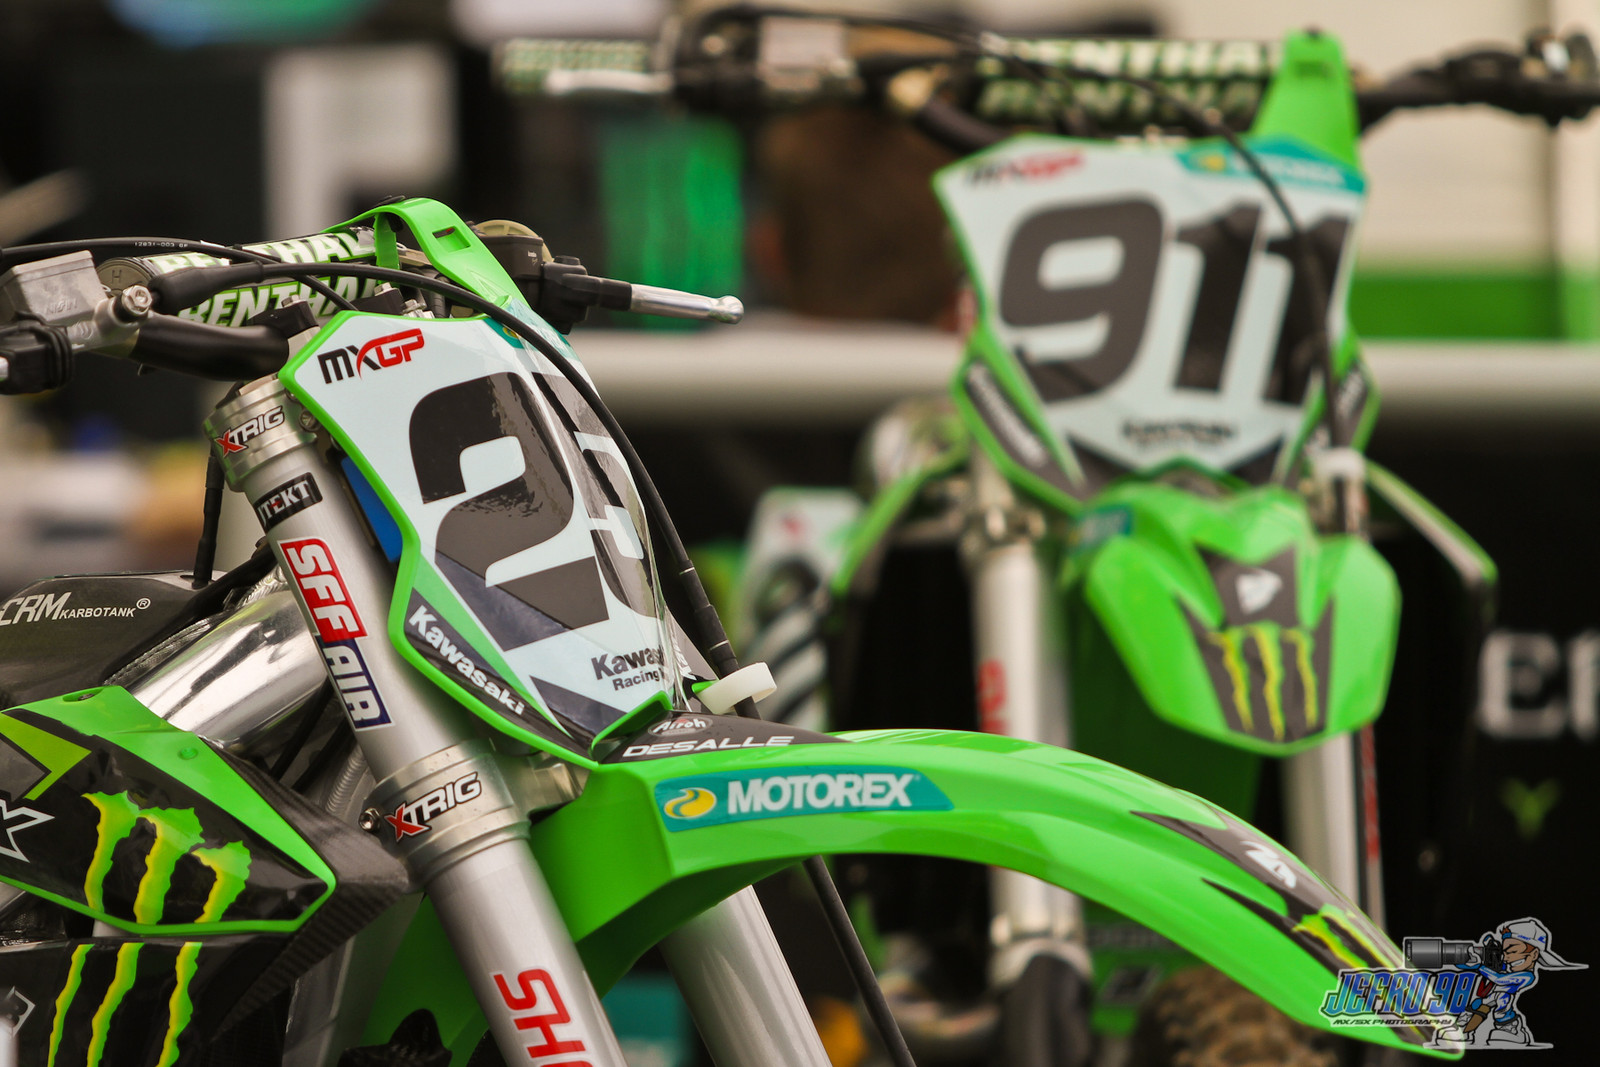 Team Kawasaki - Photo Gallery: MXGP of Limburg - Motocross Pictures - Vital MX